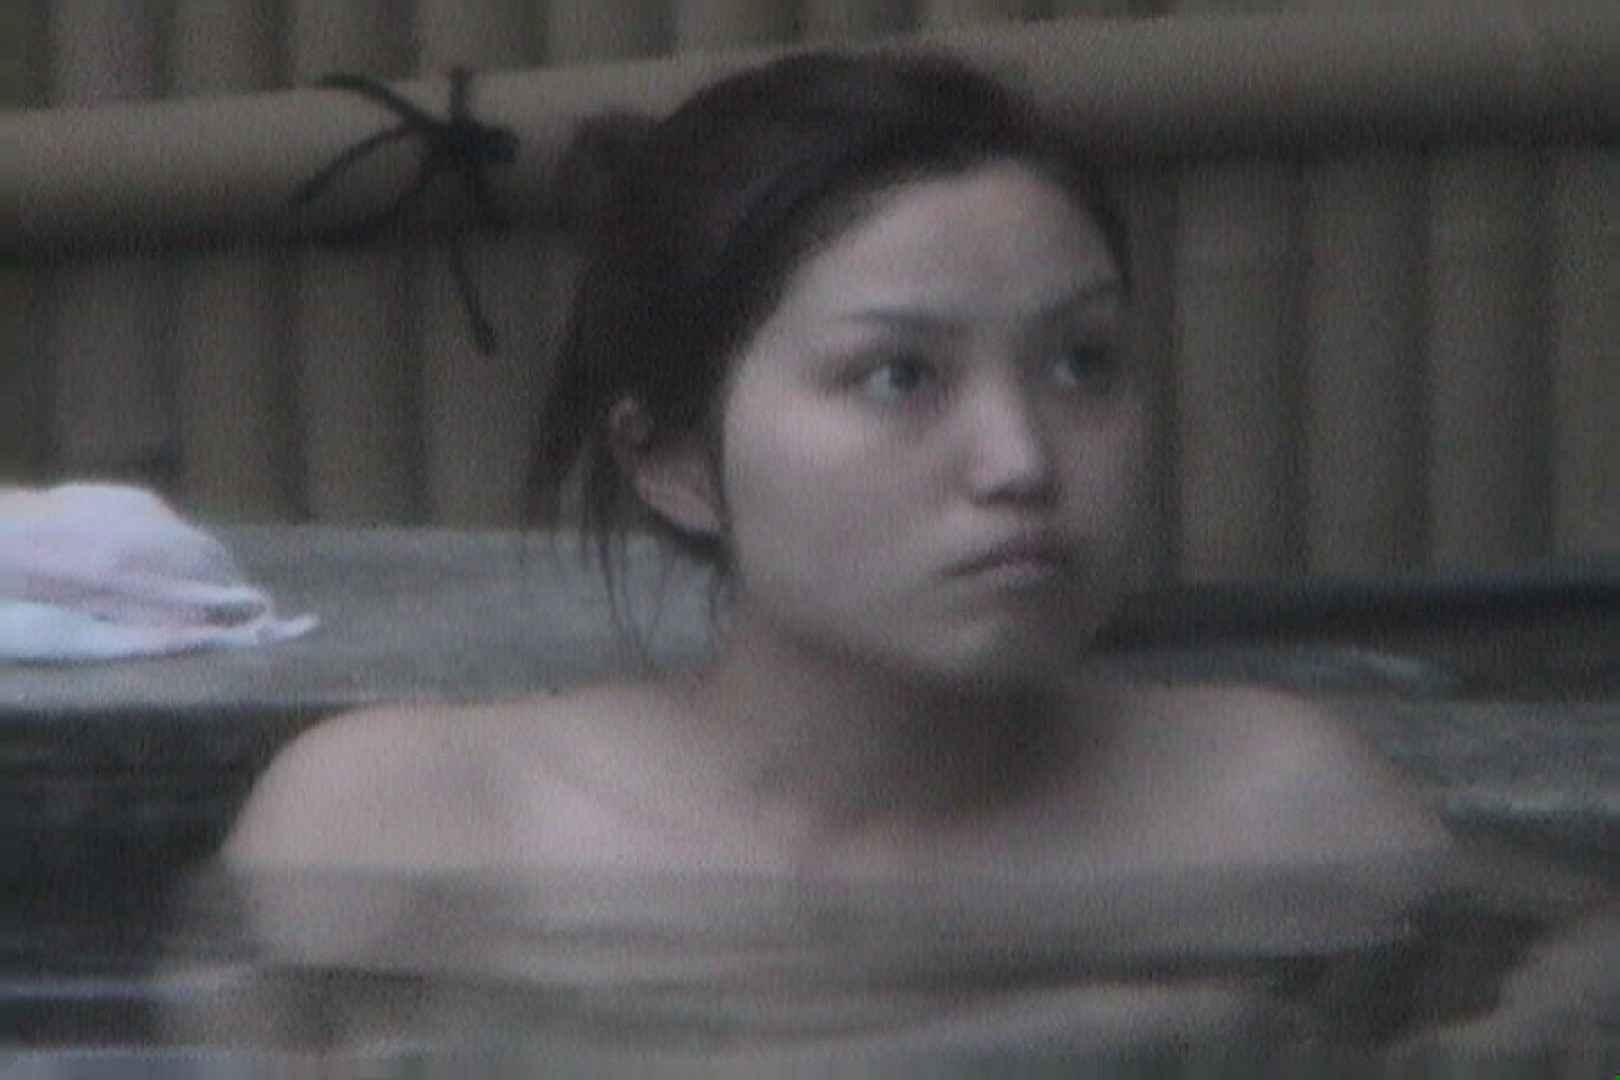 Aquaな露天風呂Vol.602 OLセックス 盗み撮りオマンコ動画キャプチャ 70画像 23